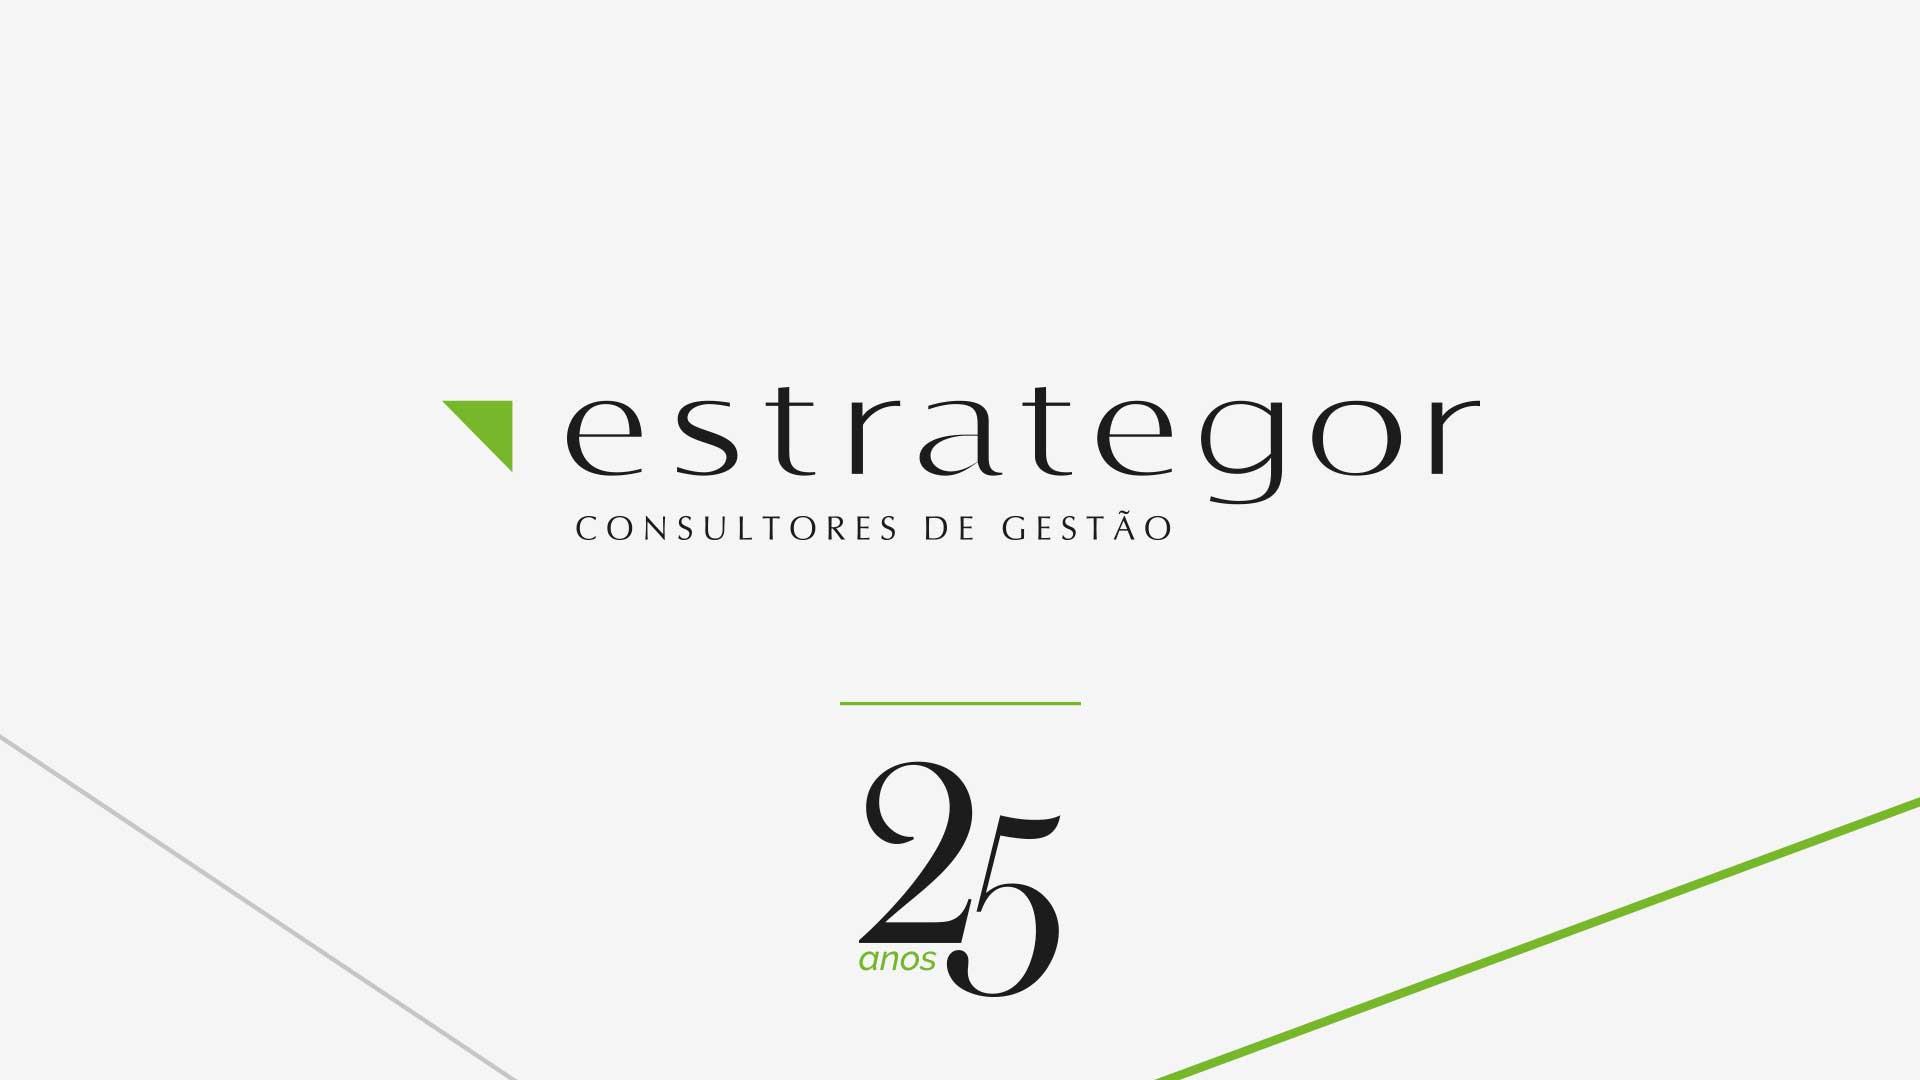 25 Anos Estrategor